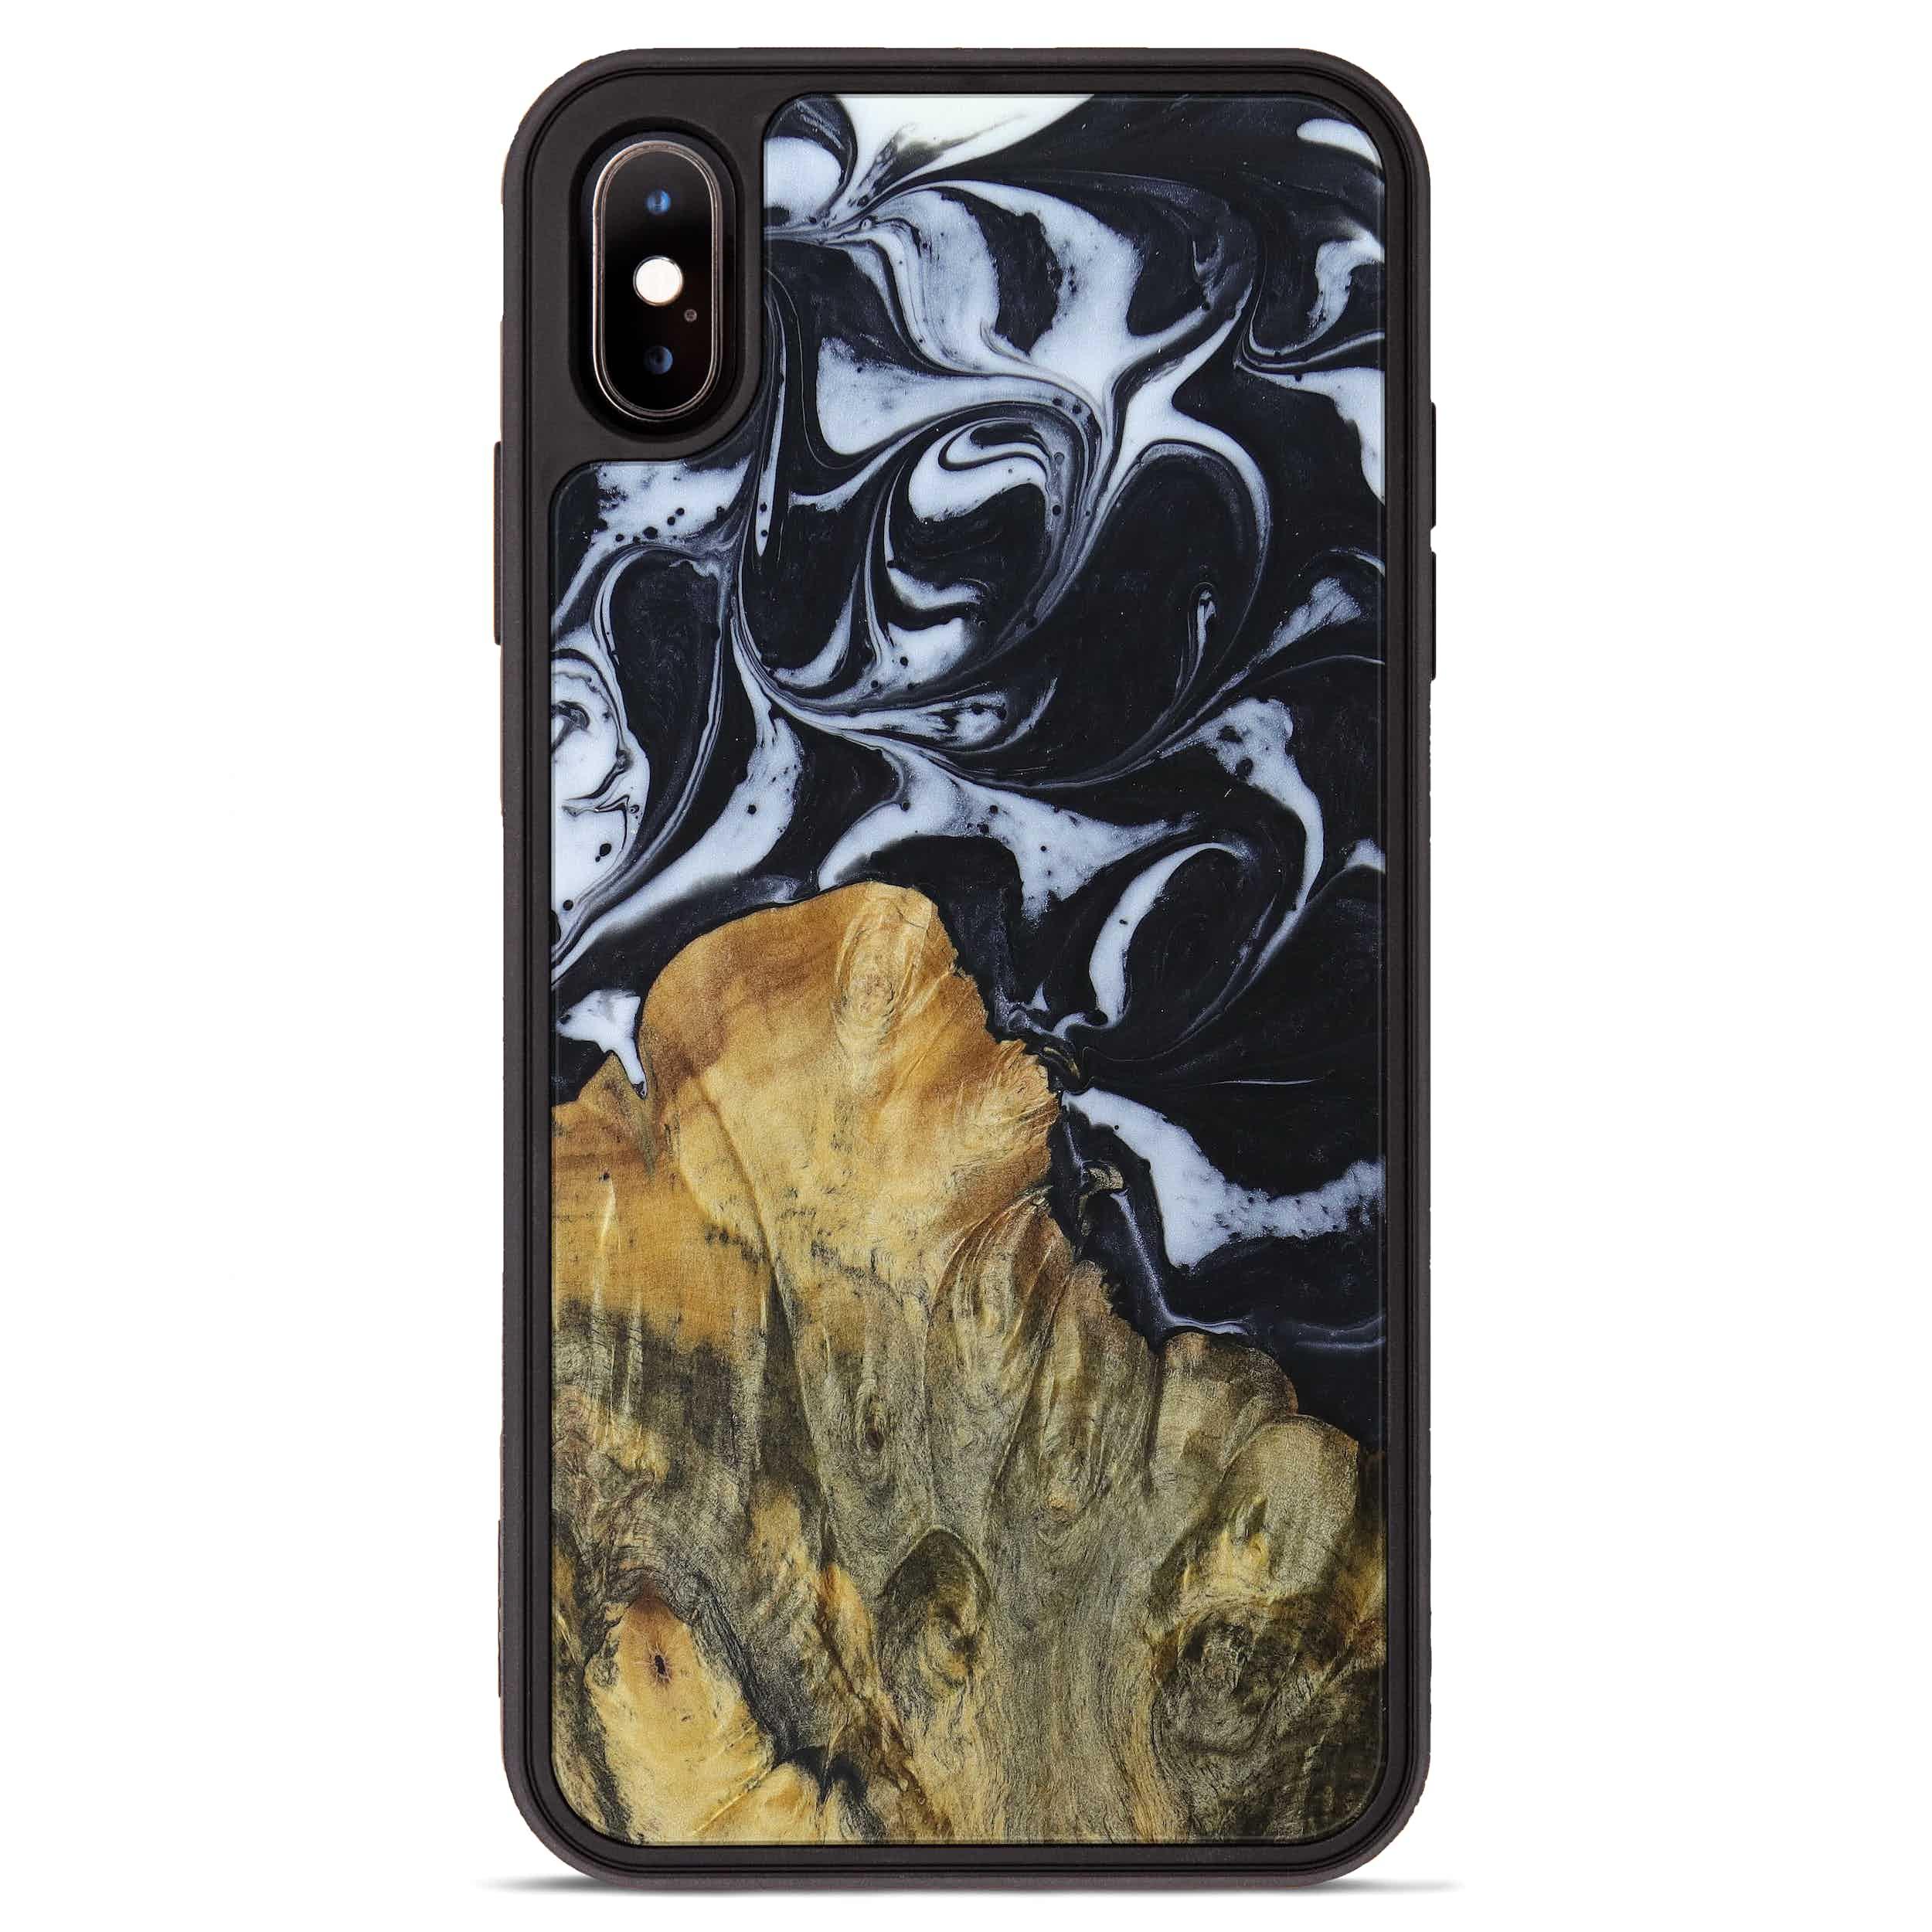 iPhone Xs Max Wood+Resin Phone Case - Antoine (Black & White, 397375)